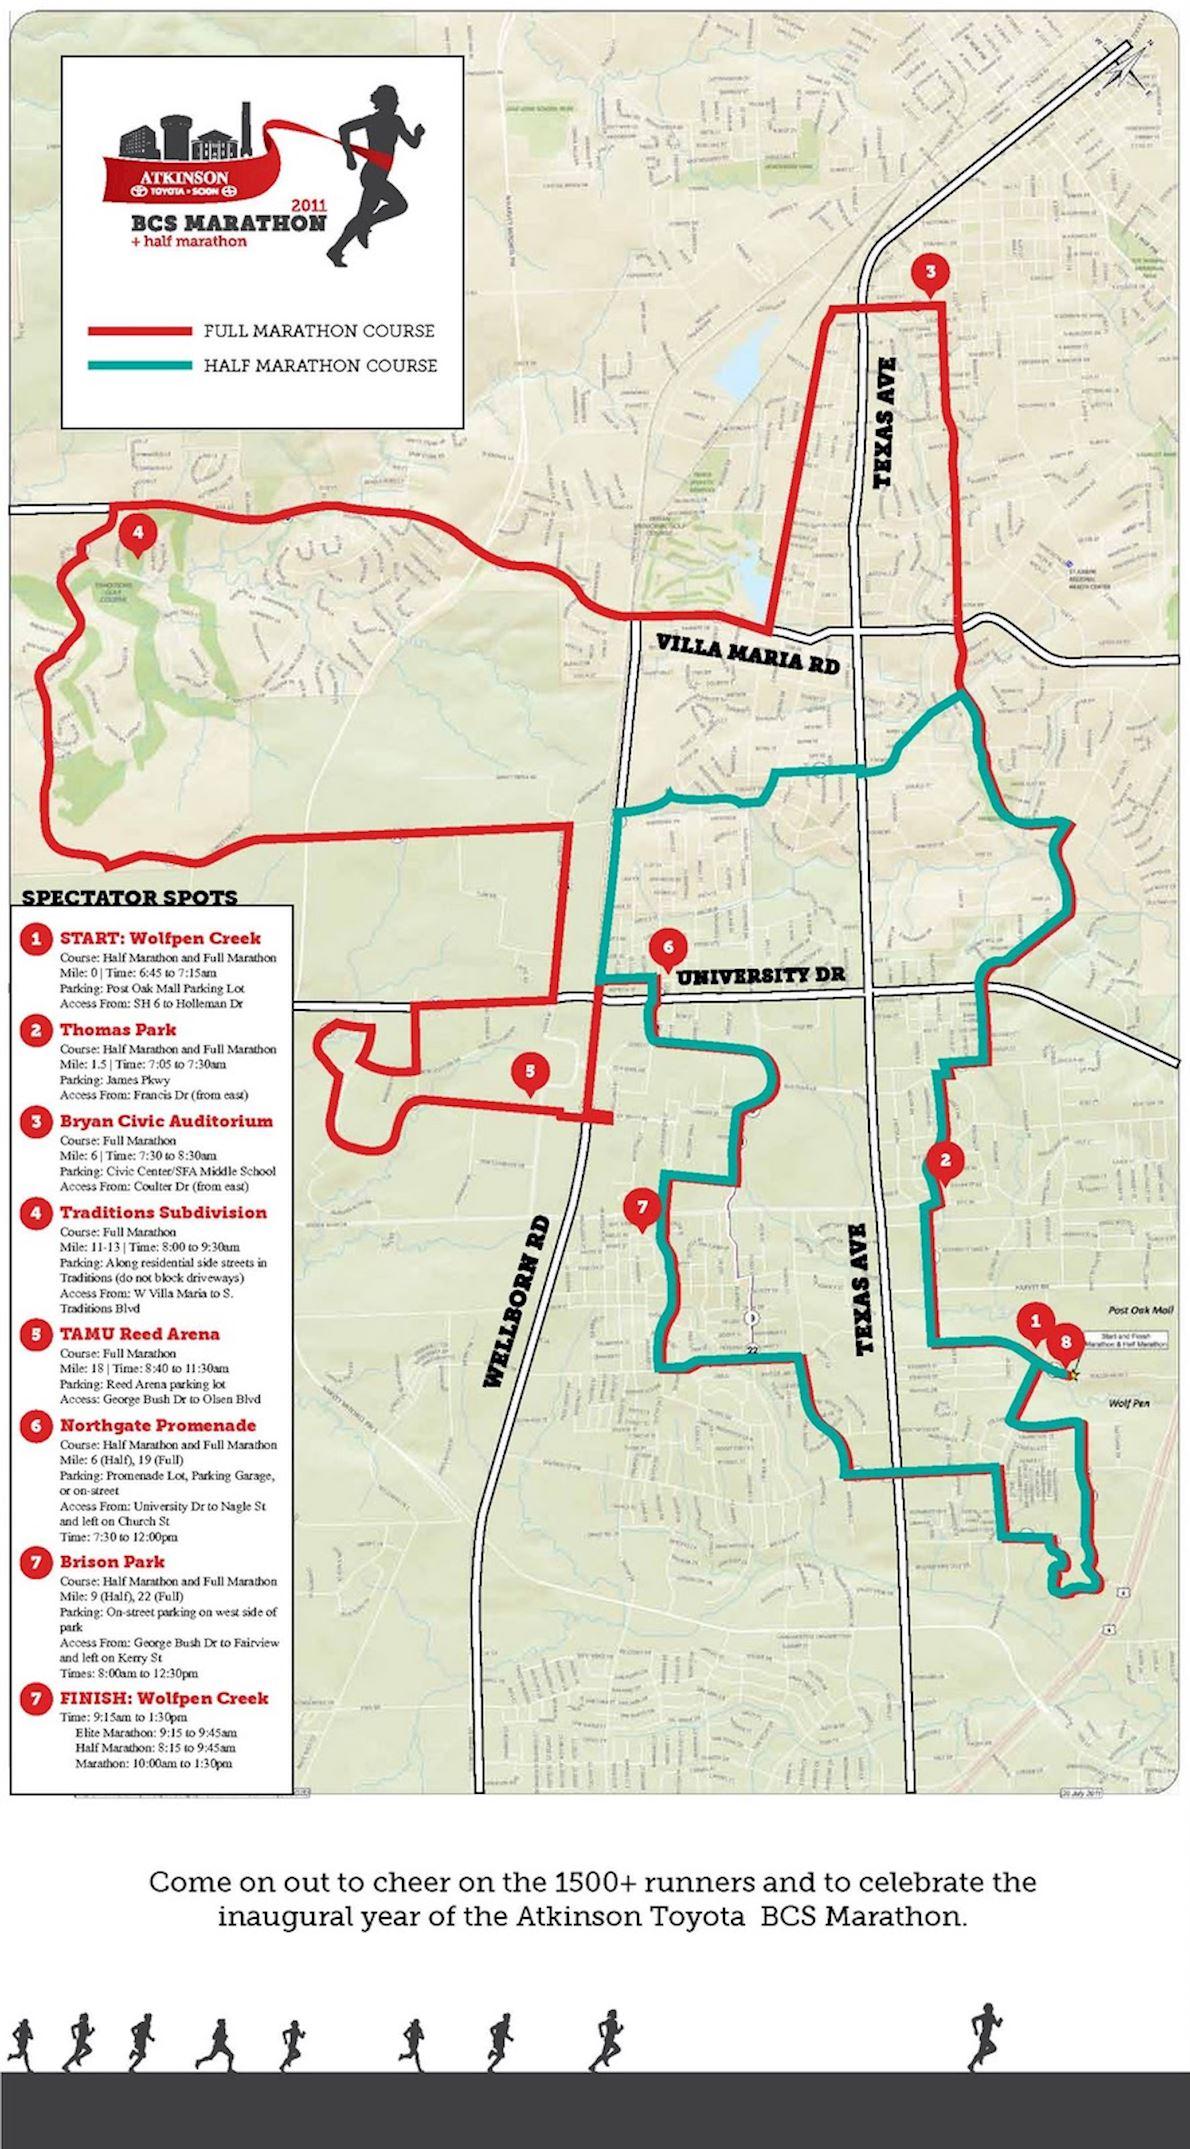 BCS Marathon and Half Marathon Mappa del percorso